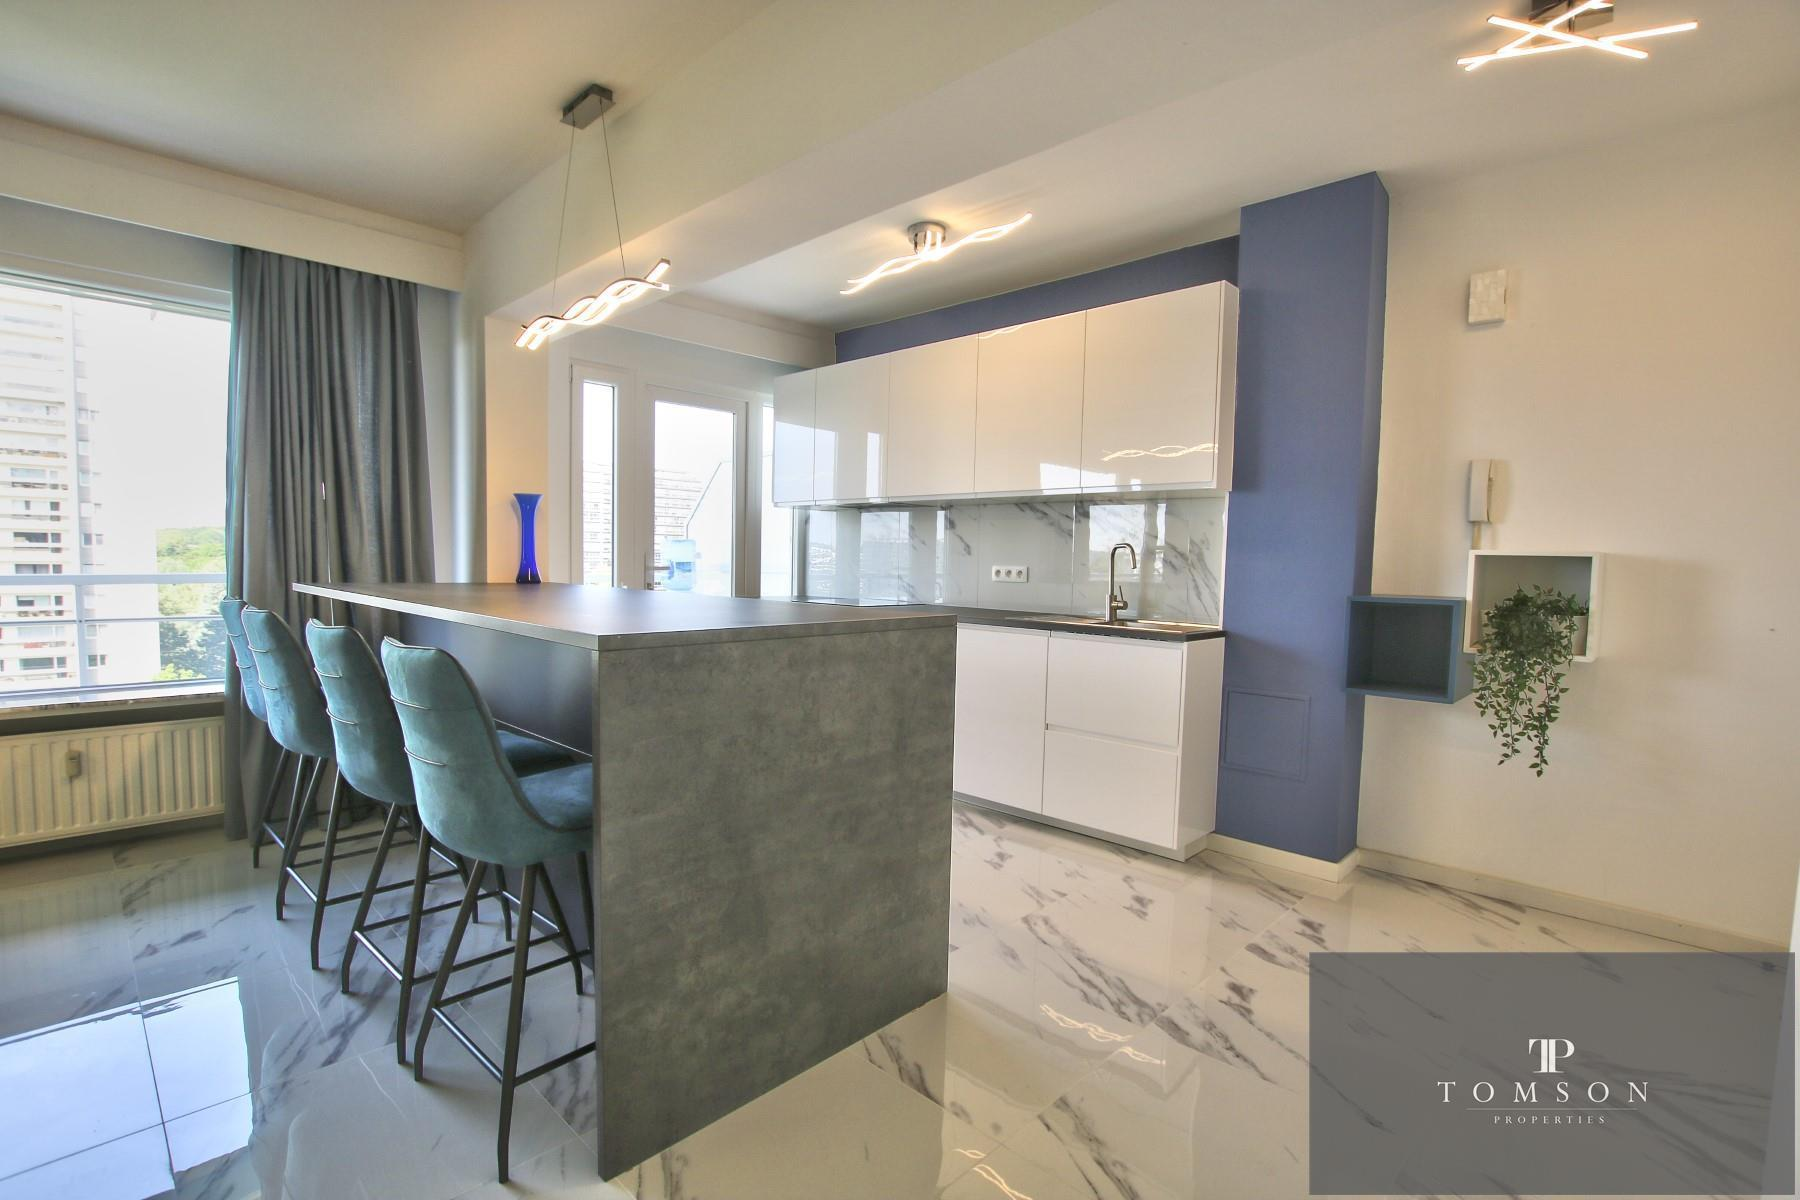 Appartement - Woluwe-Saint-Lambert - #4530510-2